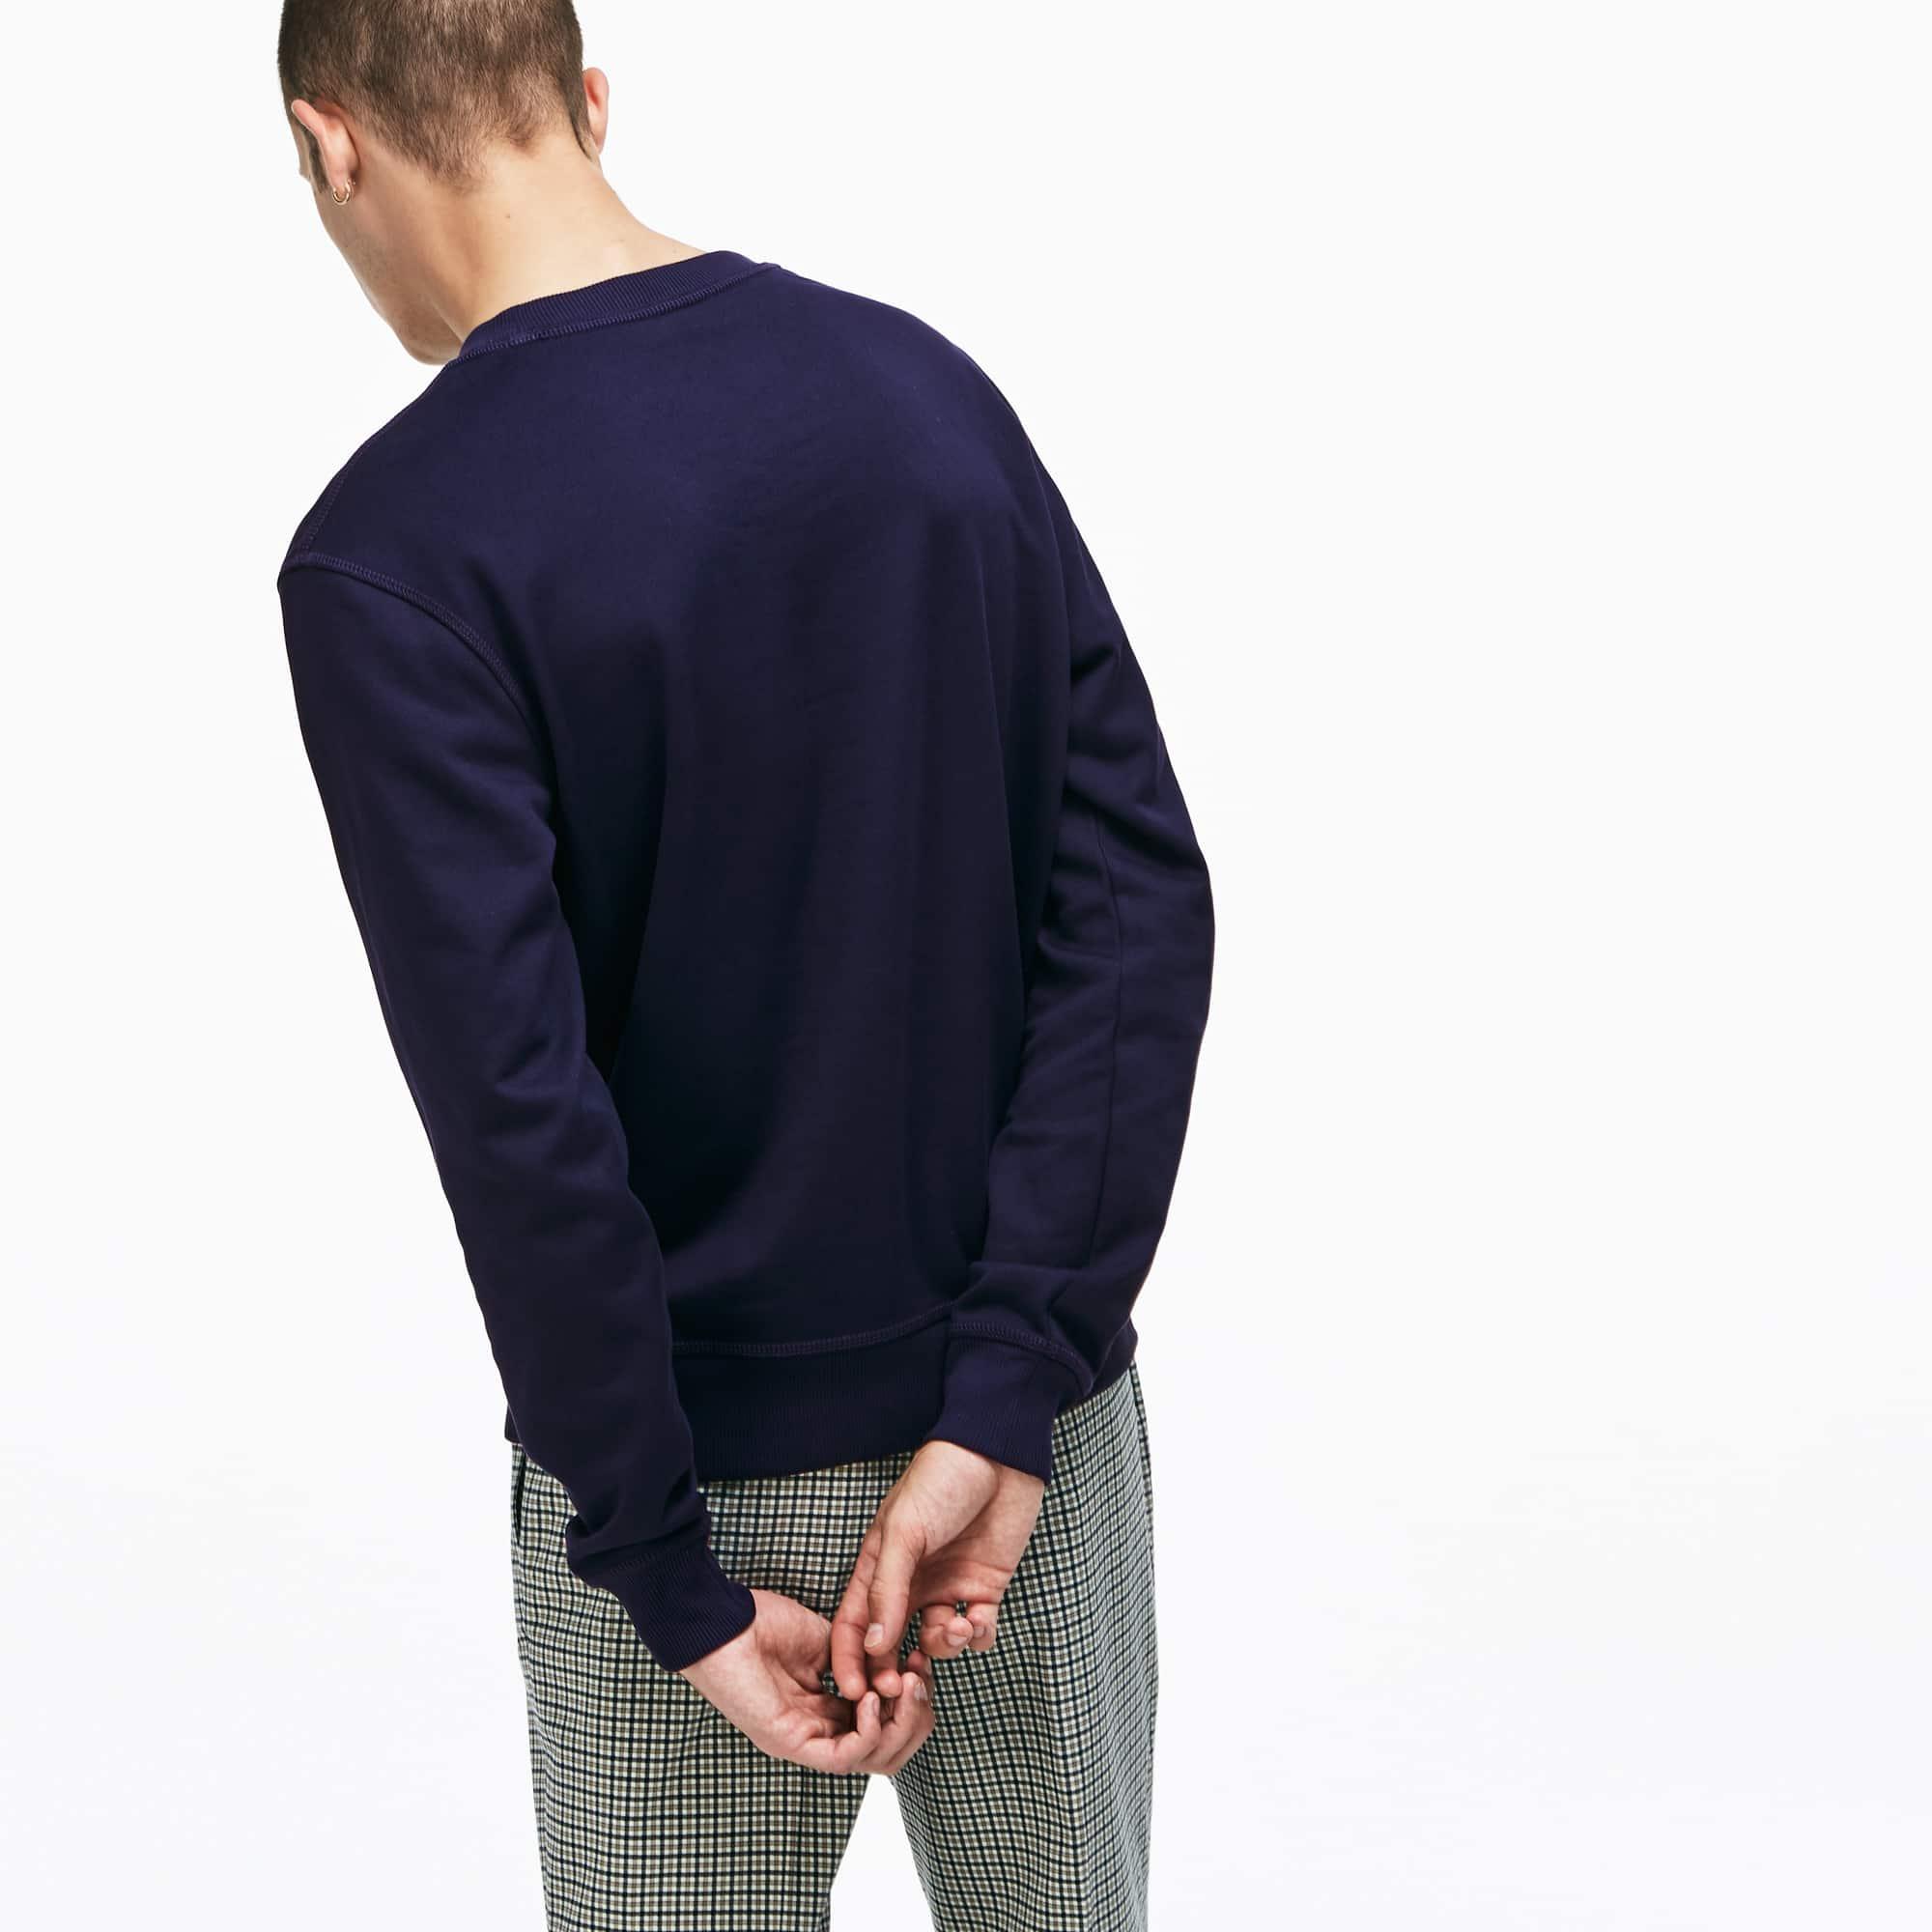 Lacoste - Unisex Lacoste LIVE Crew Neck Cotton Fleece Sweatshirt - 5